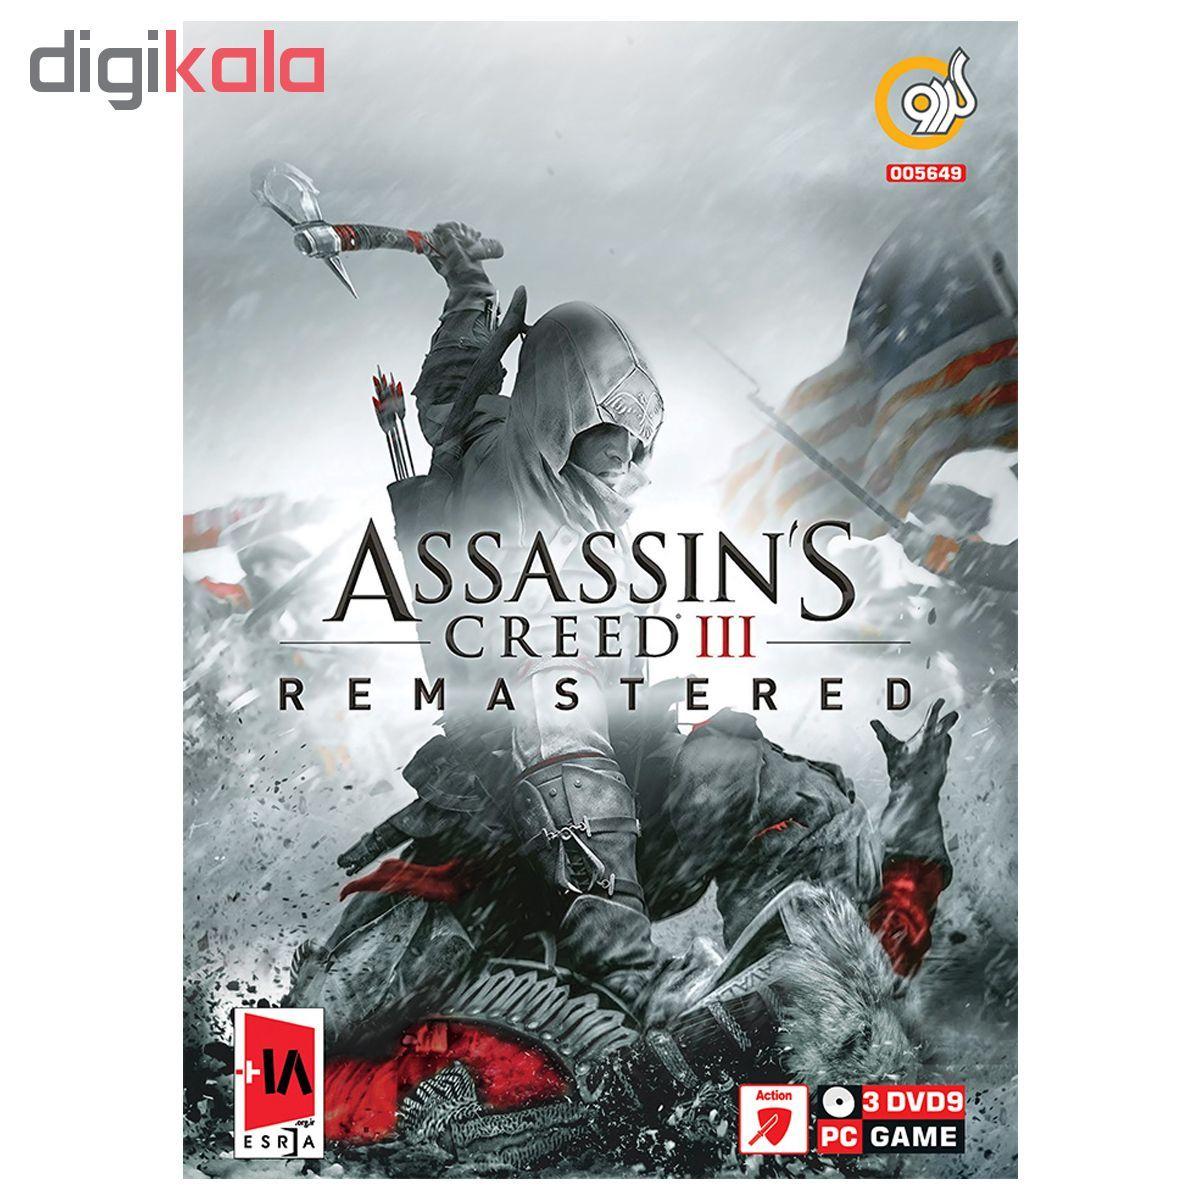 بازی Assassin's Creed III Remastered مخصوص PC نشر گردو main 1 1